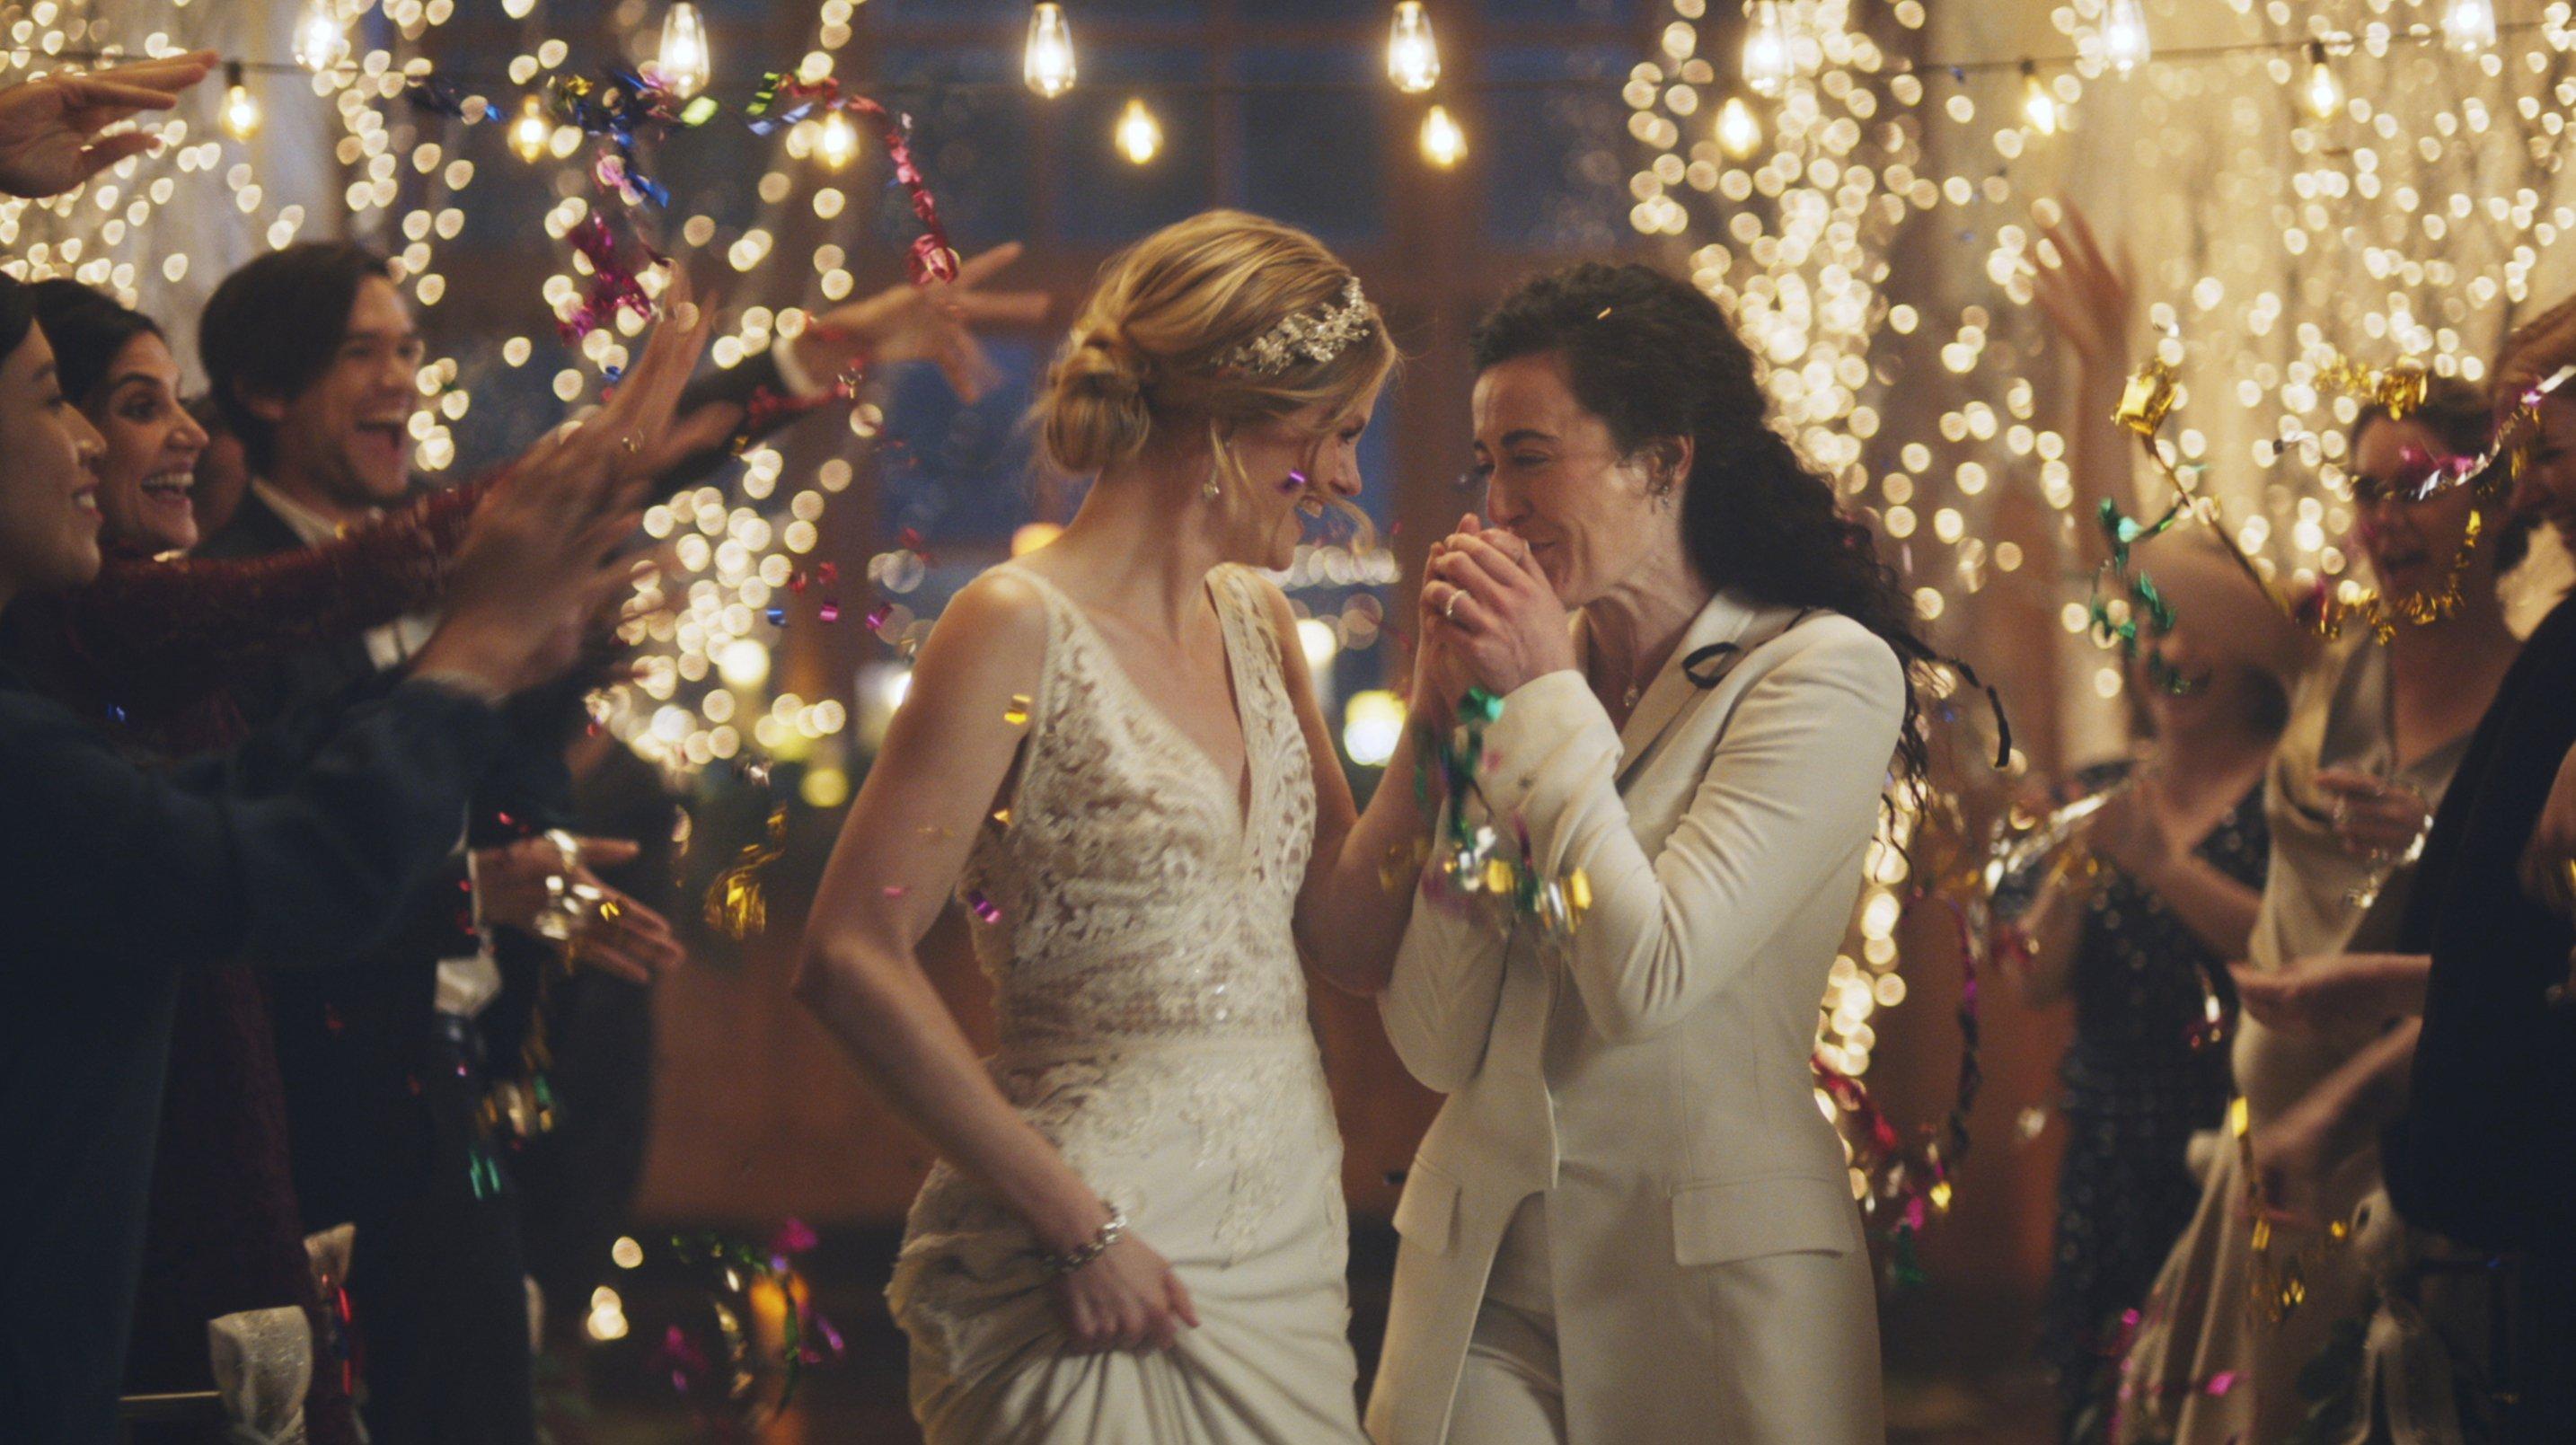 Hallmark draws criticism after pulling same-sex wedding ads